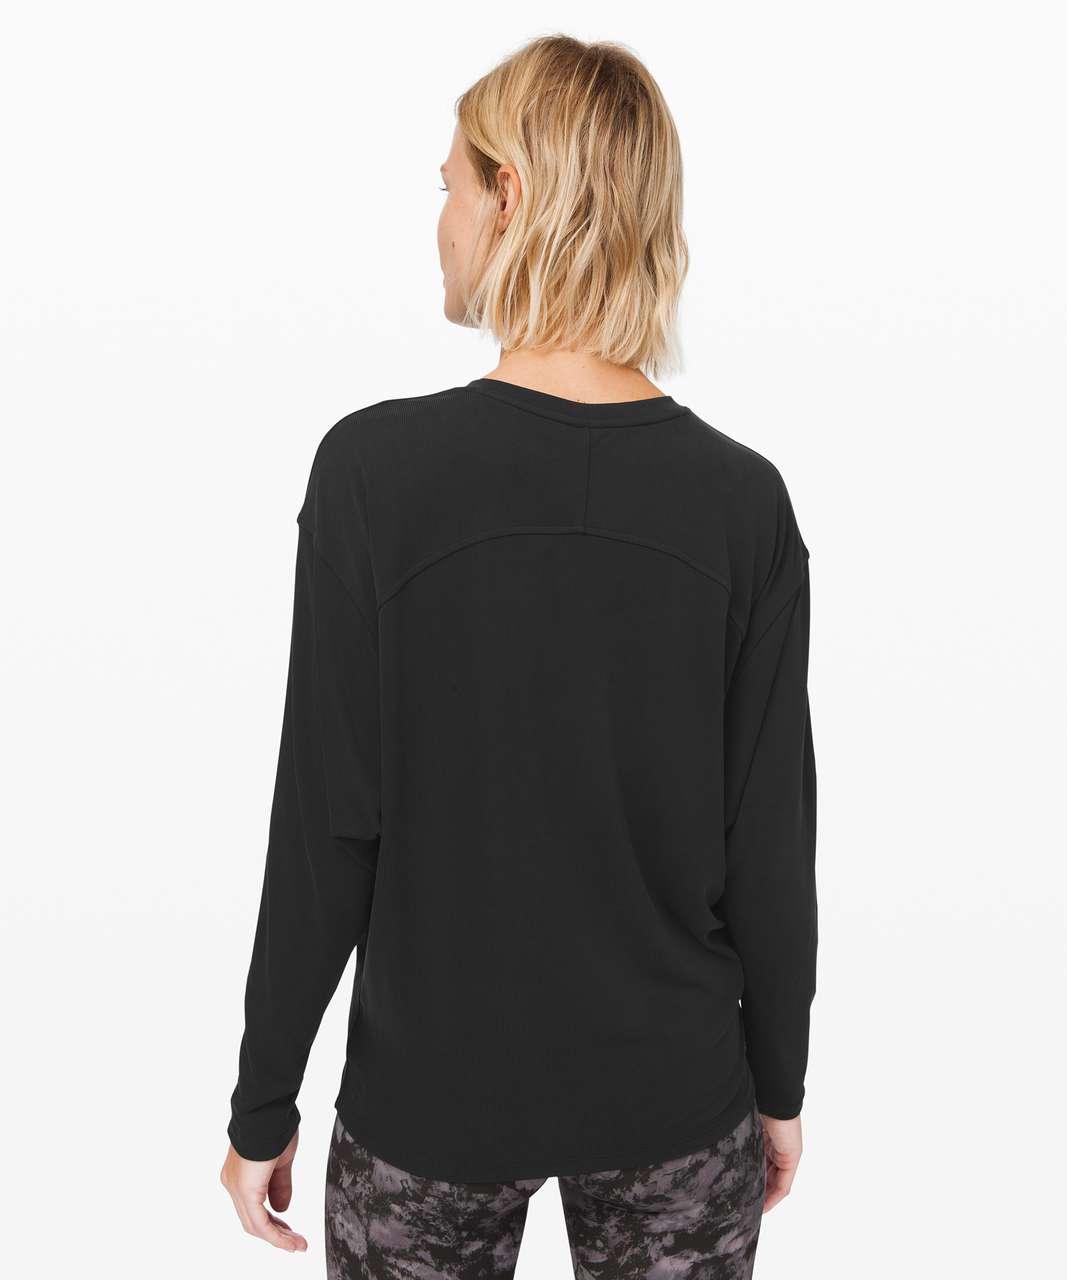 Lululemon Loungeful Drape Long Sleeve *Cupro - Black